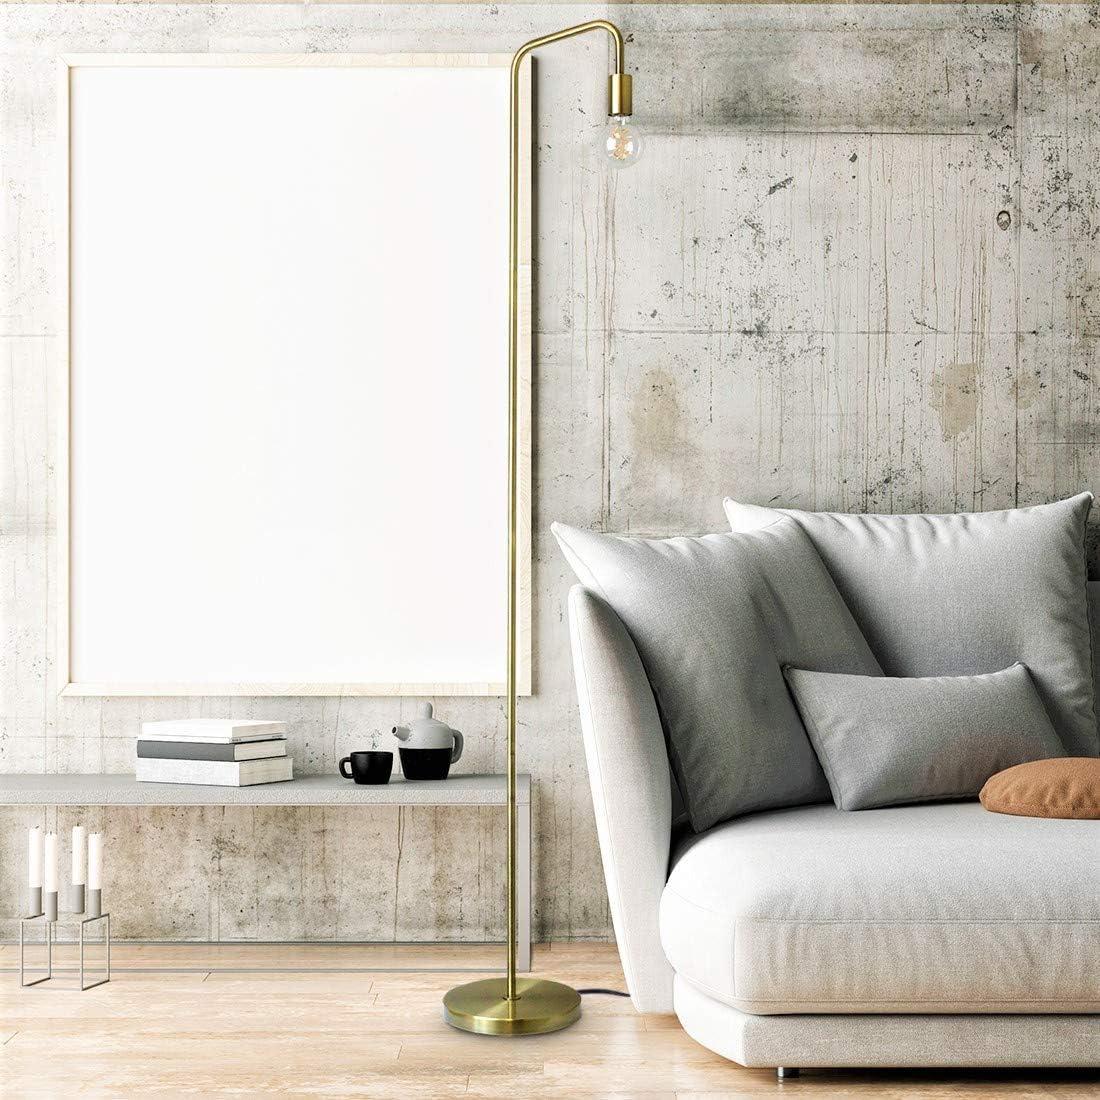 E26 Socket 100/% Metal Lamp Minimalist Design for Decorative Lighting O/'Bright Industrial Floor Lamp for Living Room ETL Listed Antique Brass Gold Stand Lamp for Bedroom//Office//Dorm